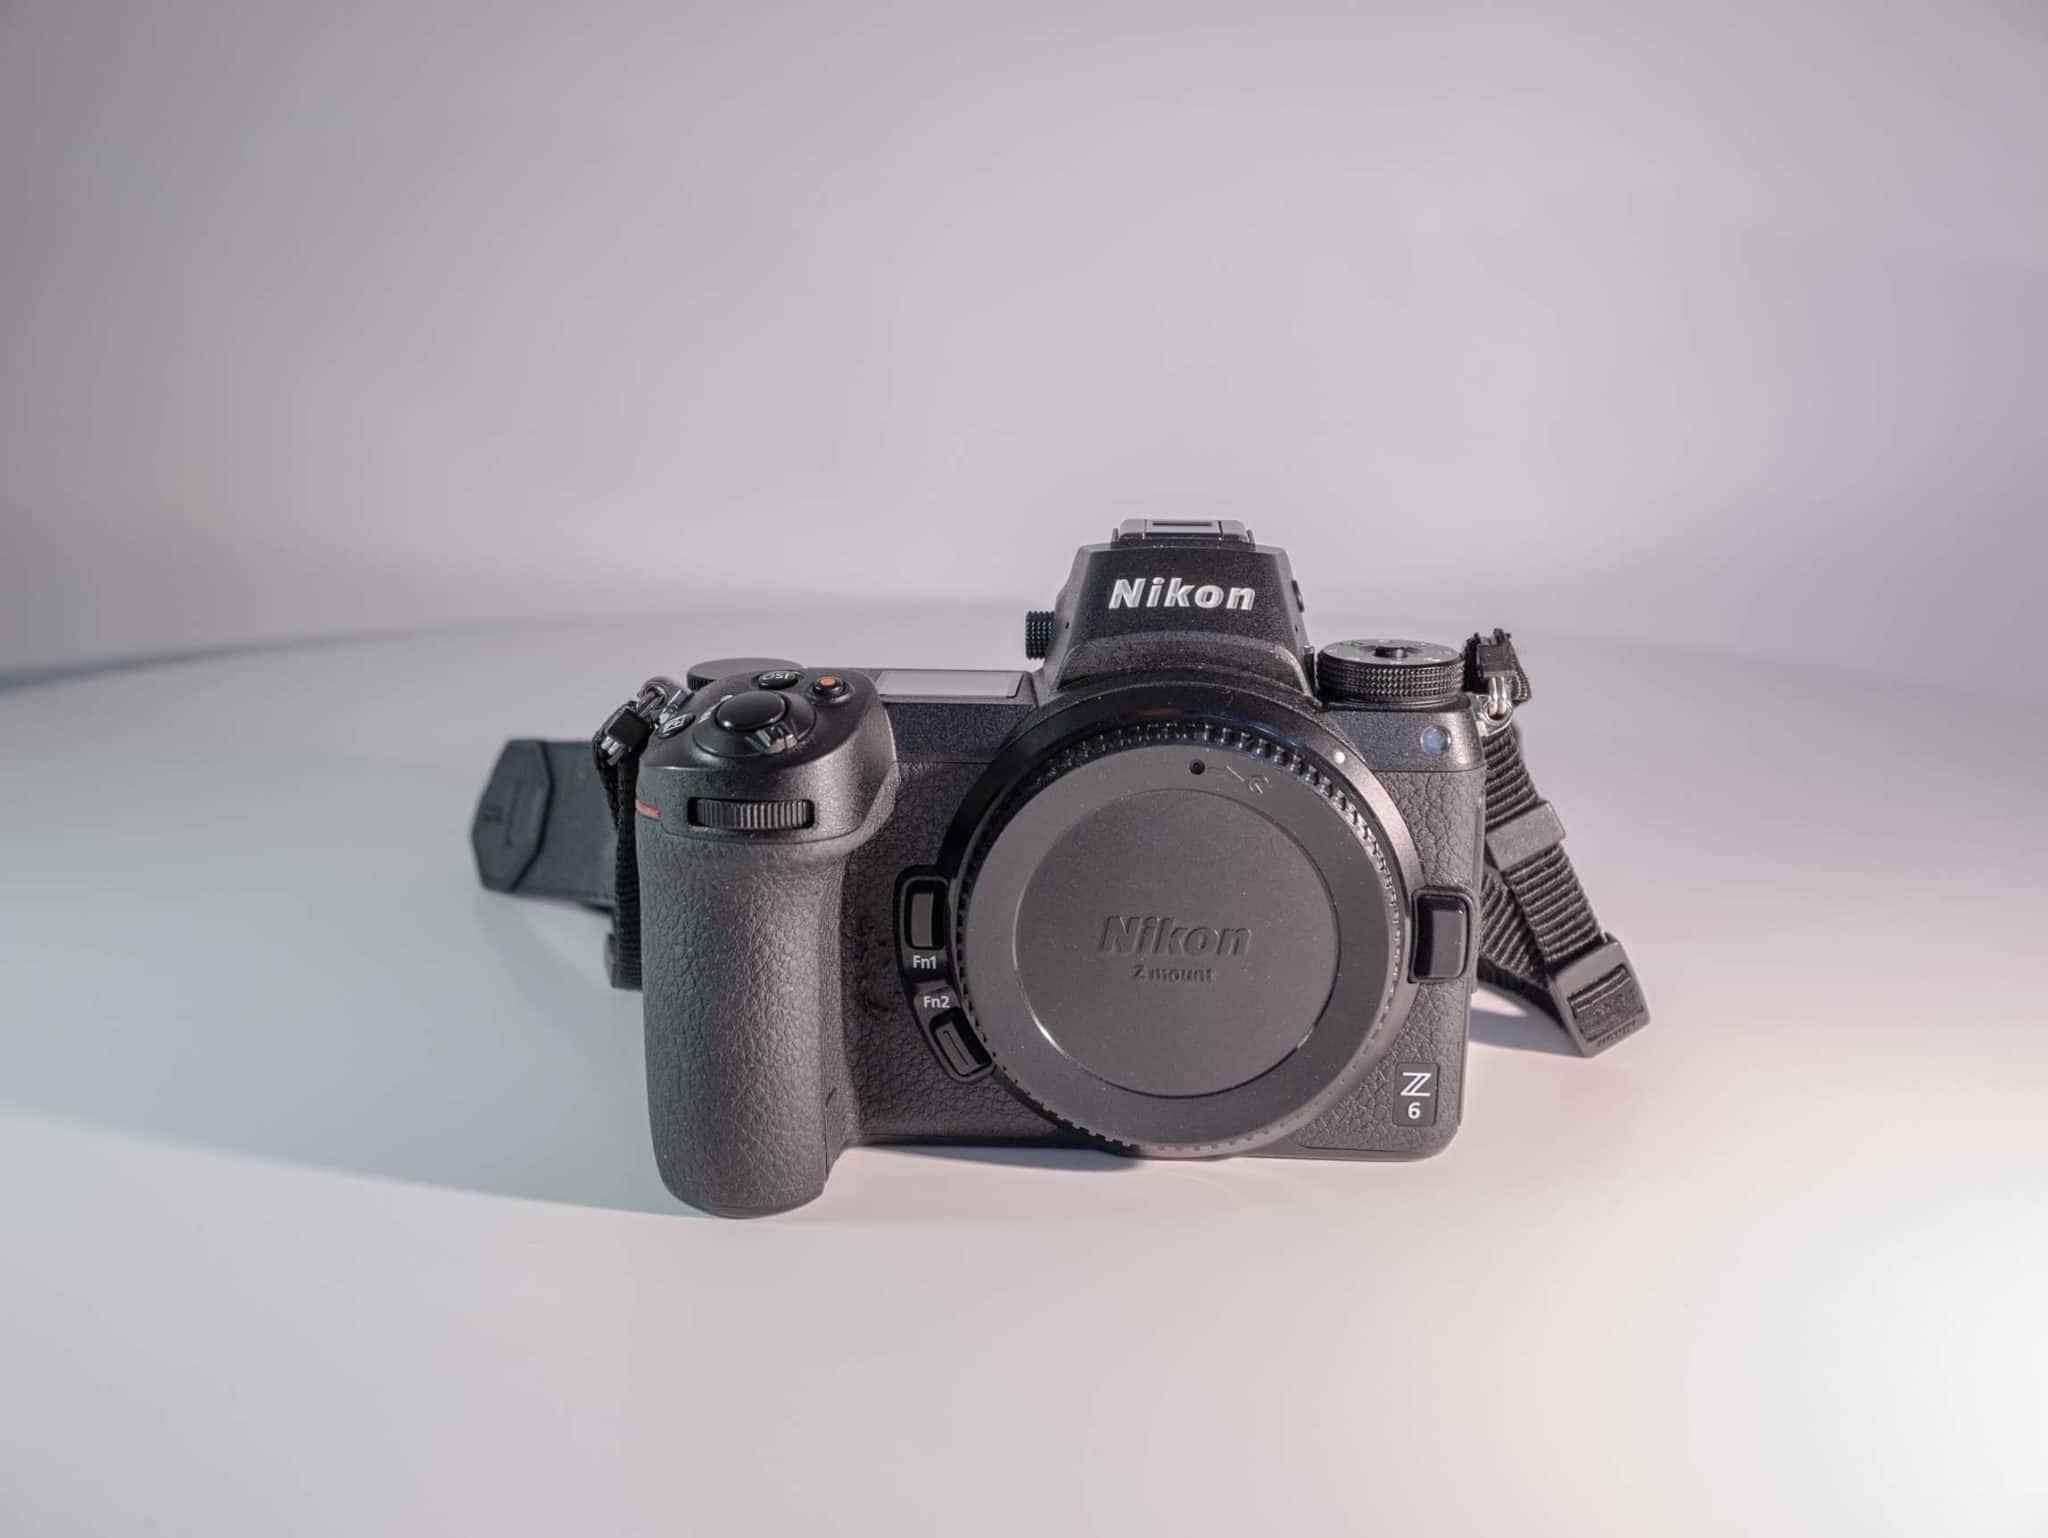 Photo du Nikon Z6 frontale